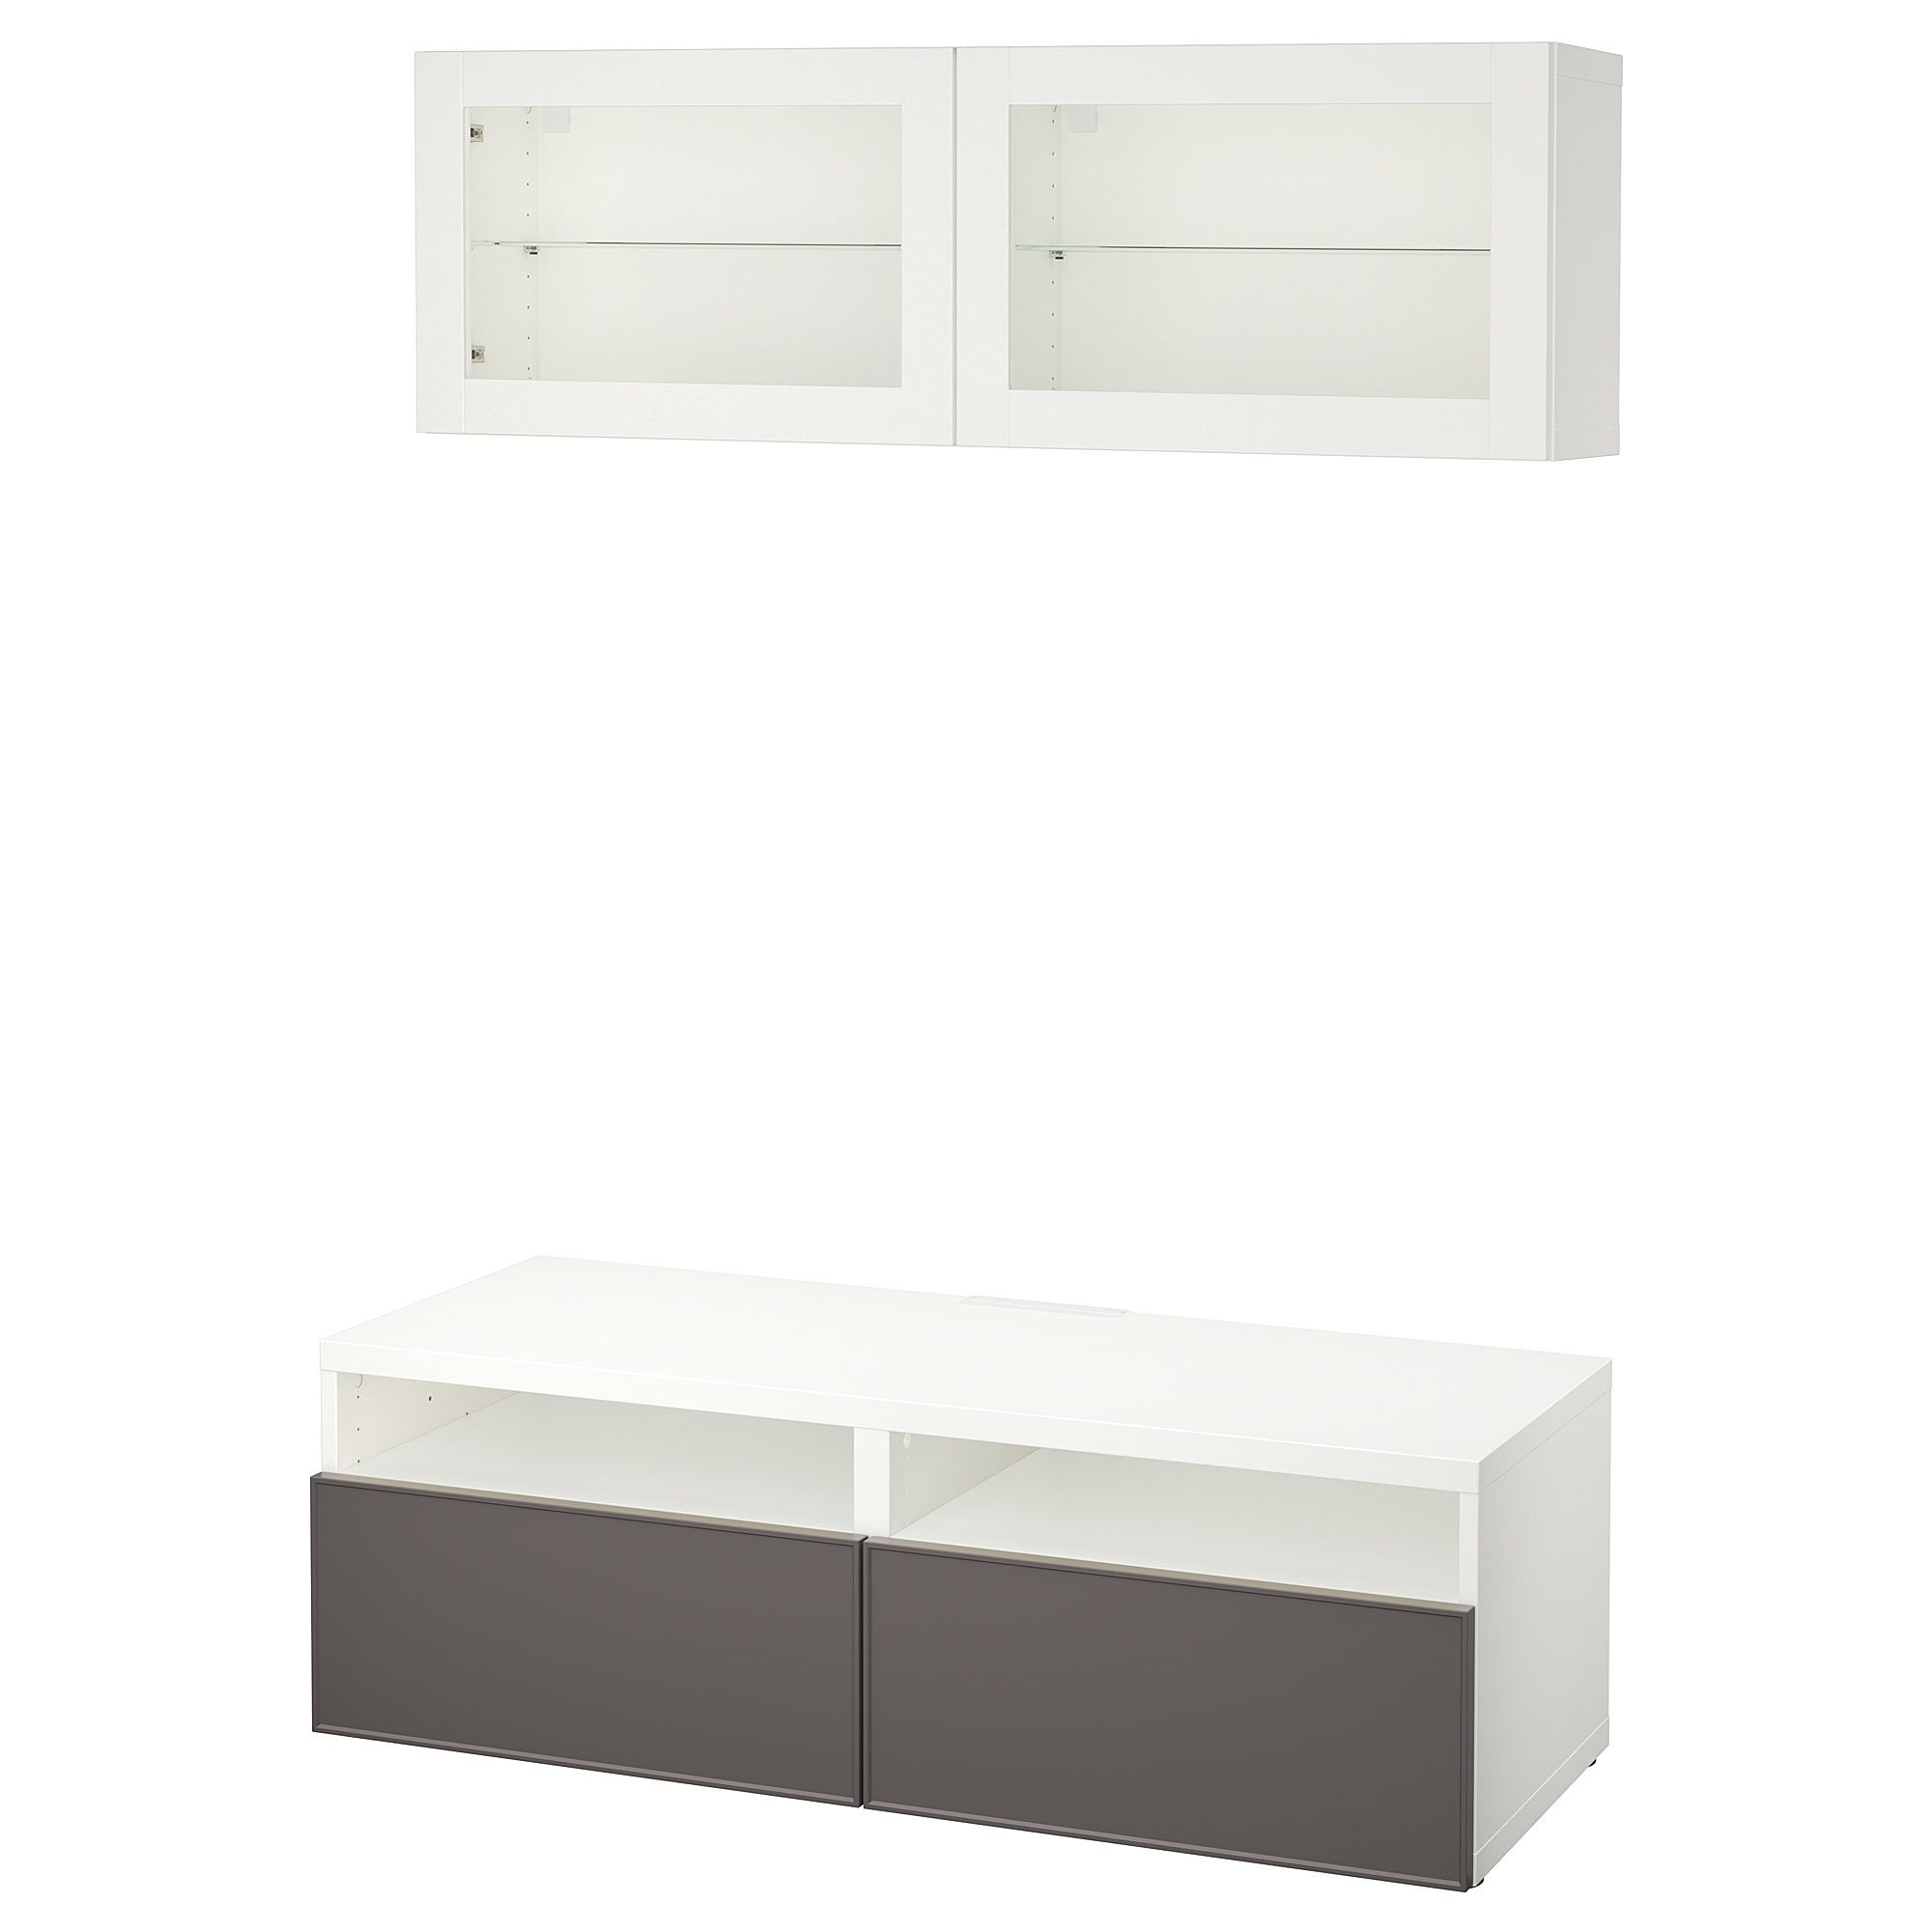 Us Furniture And Home Furnishings Tv Storage Affordable Furniture Cheap Furniture